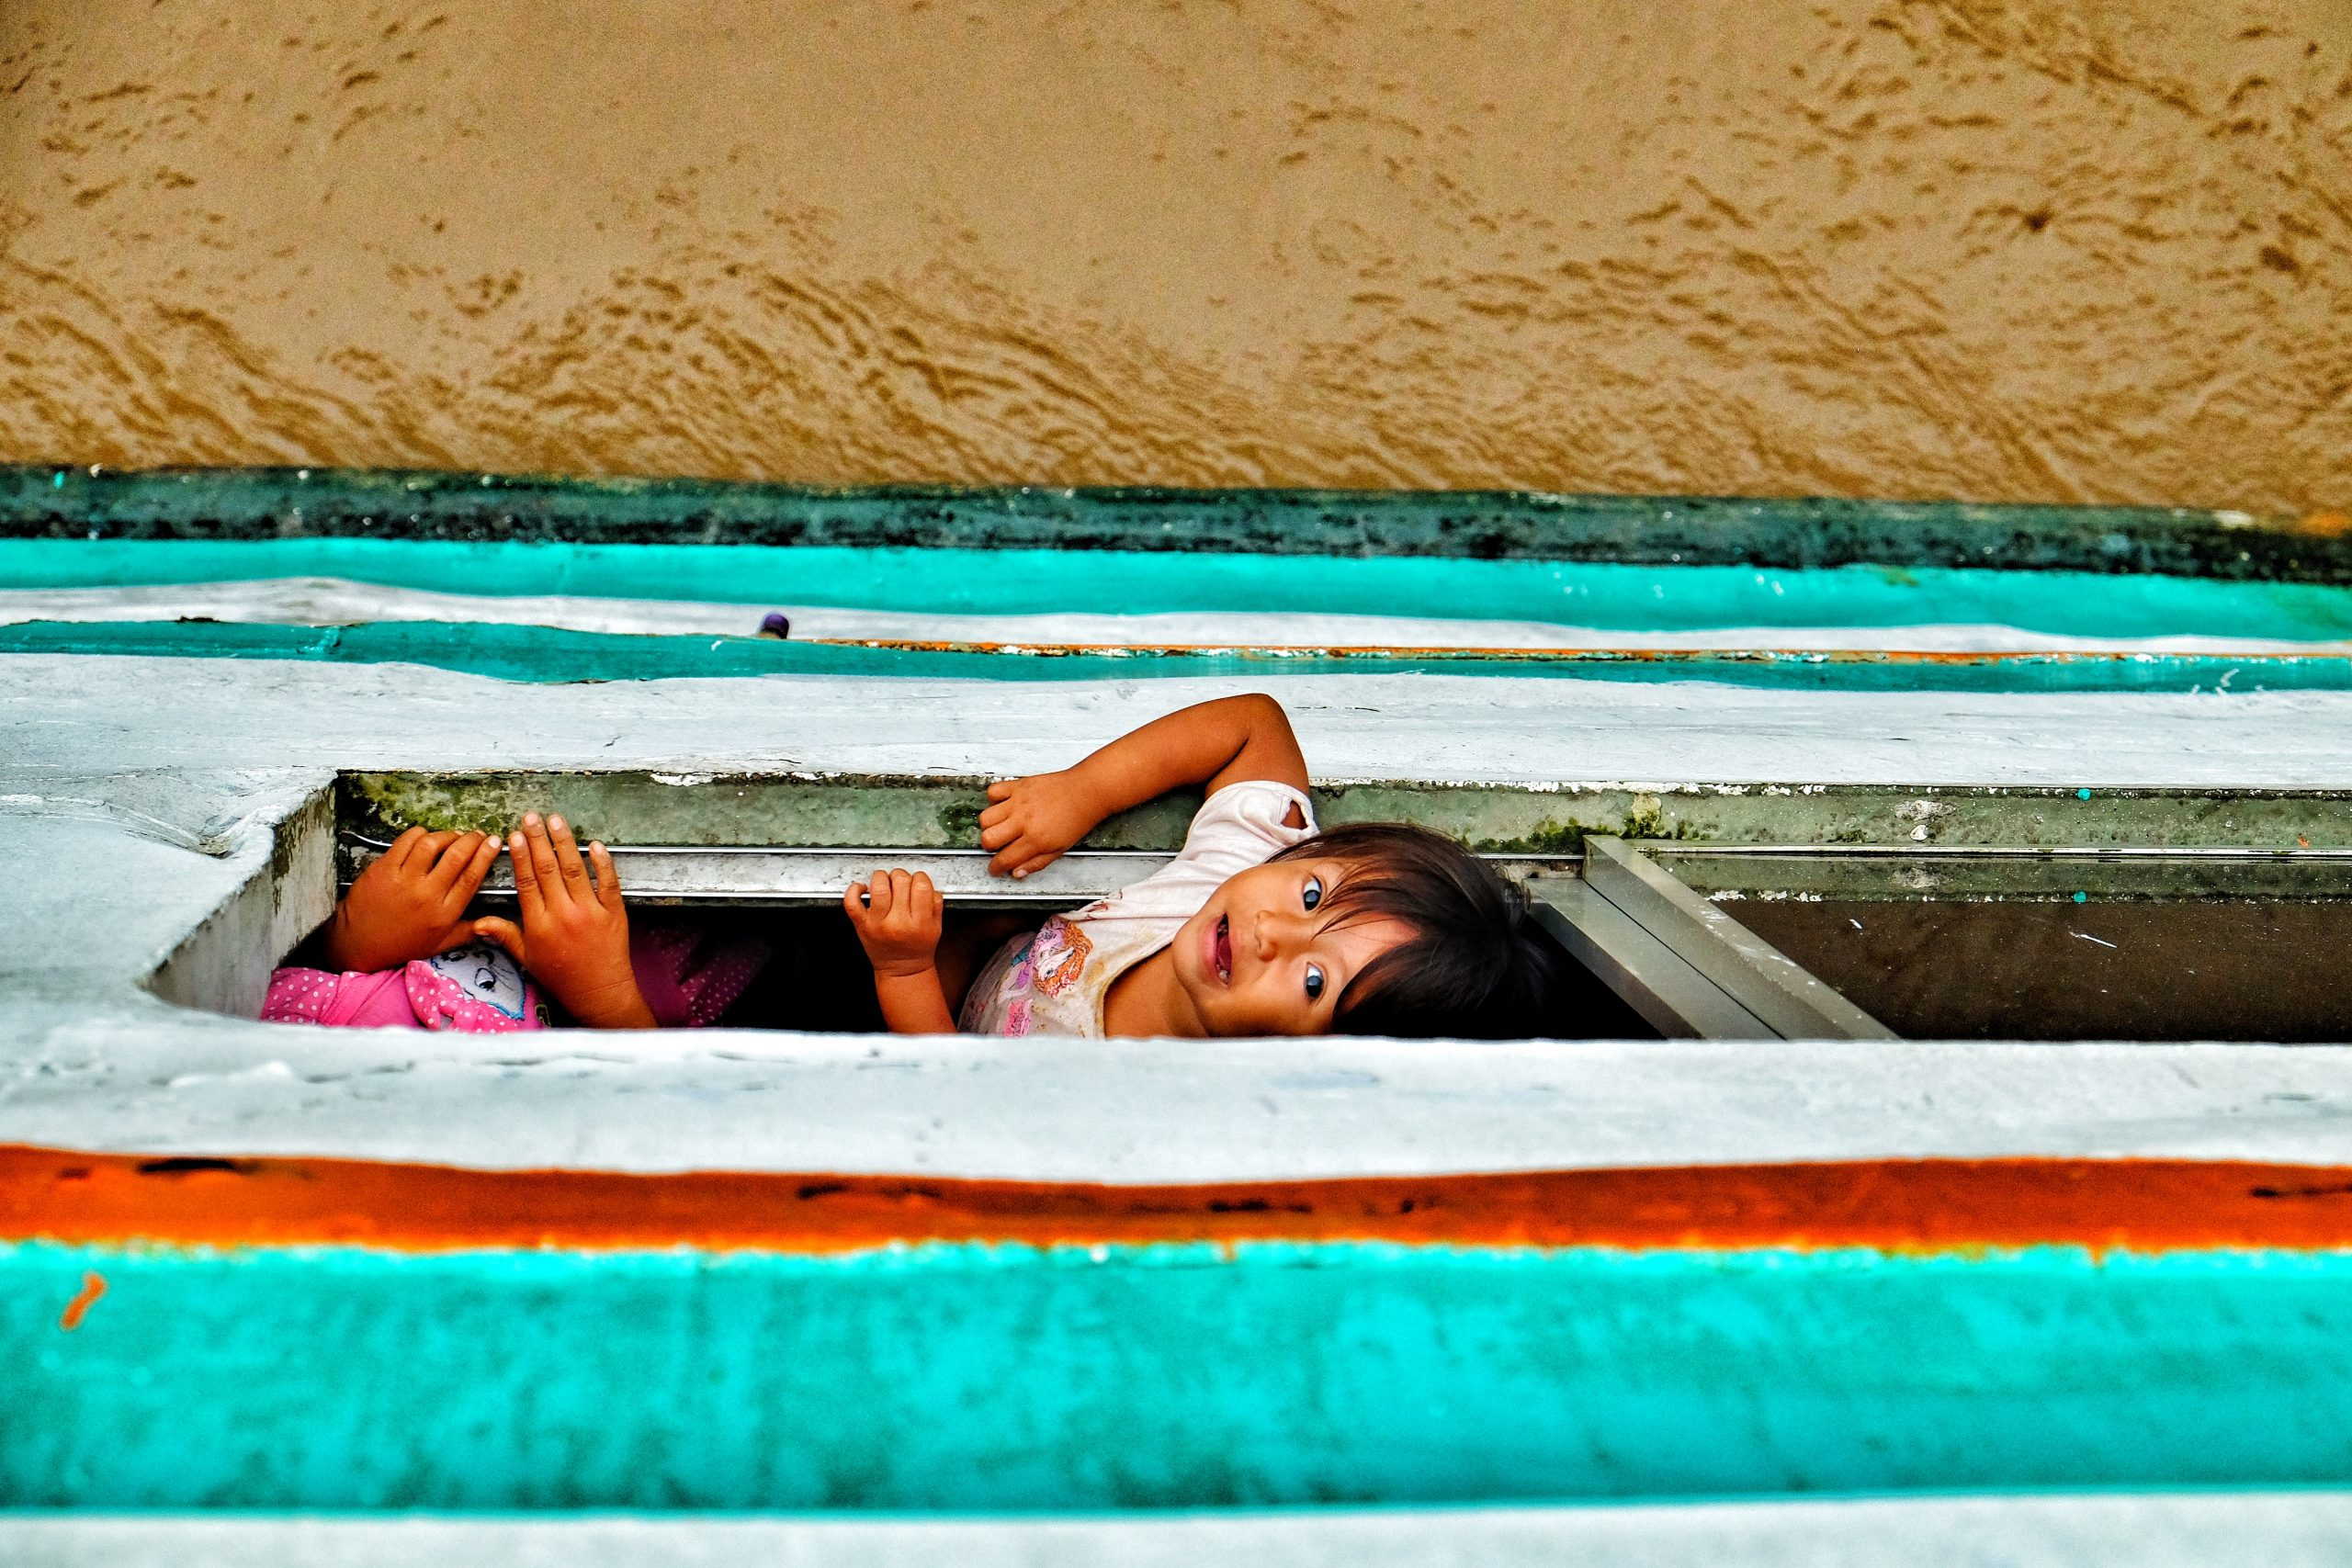 JIŽNÍ AMERIKA PERU (Amazonie)